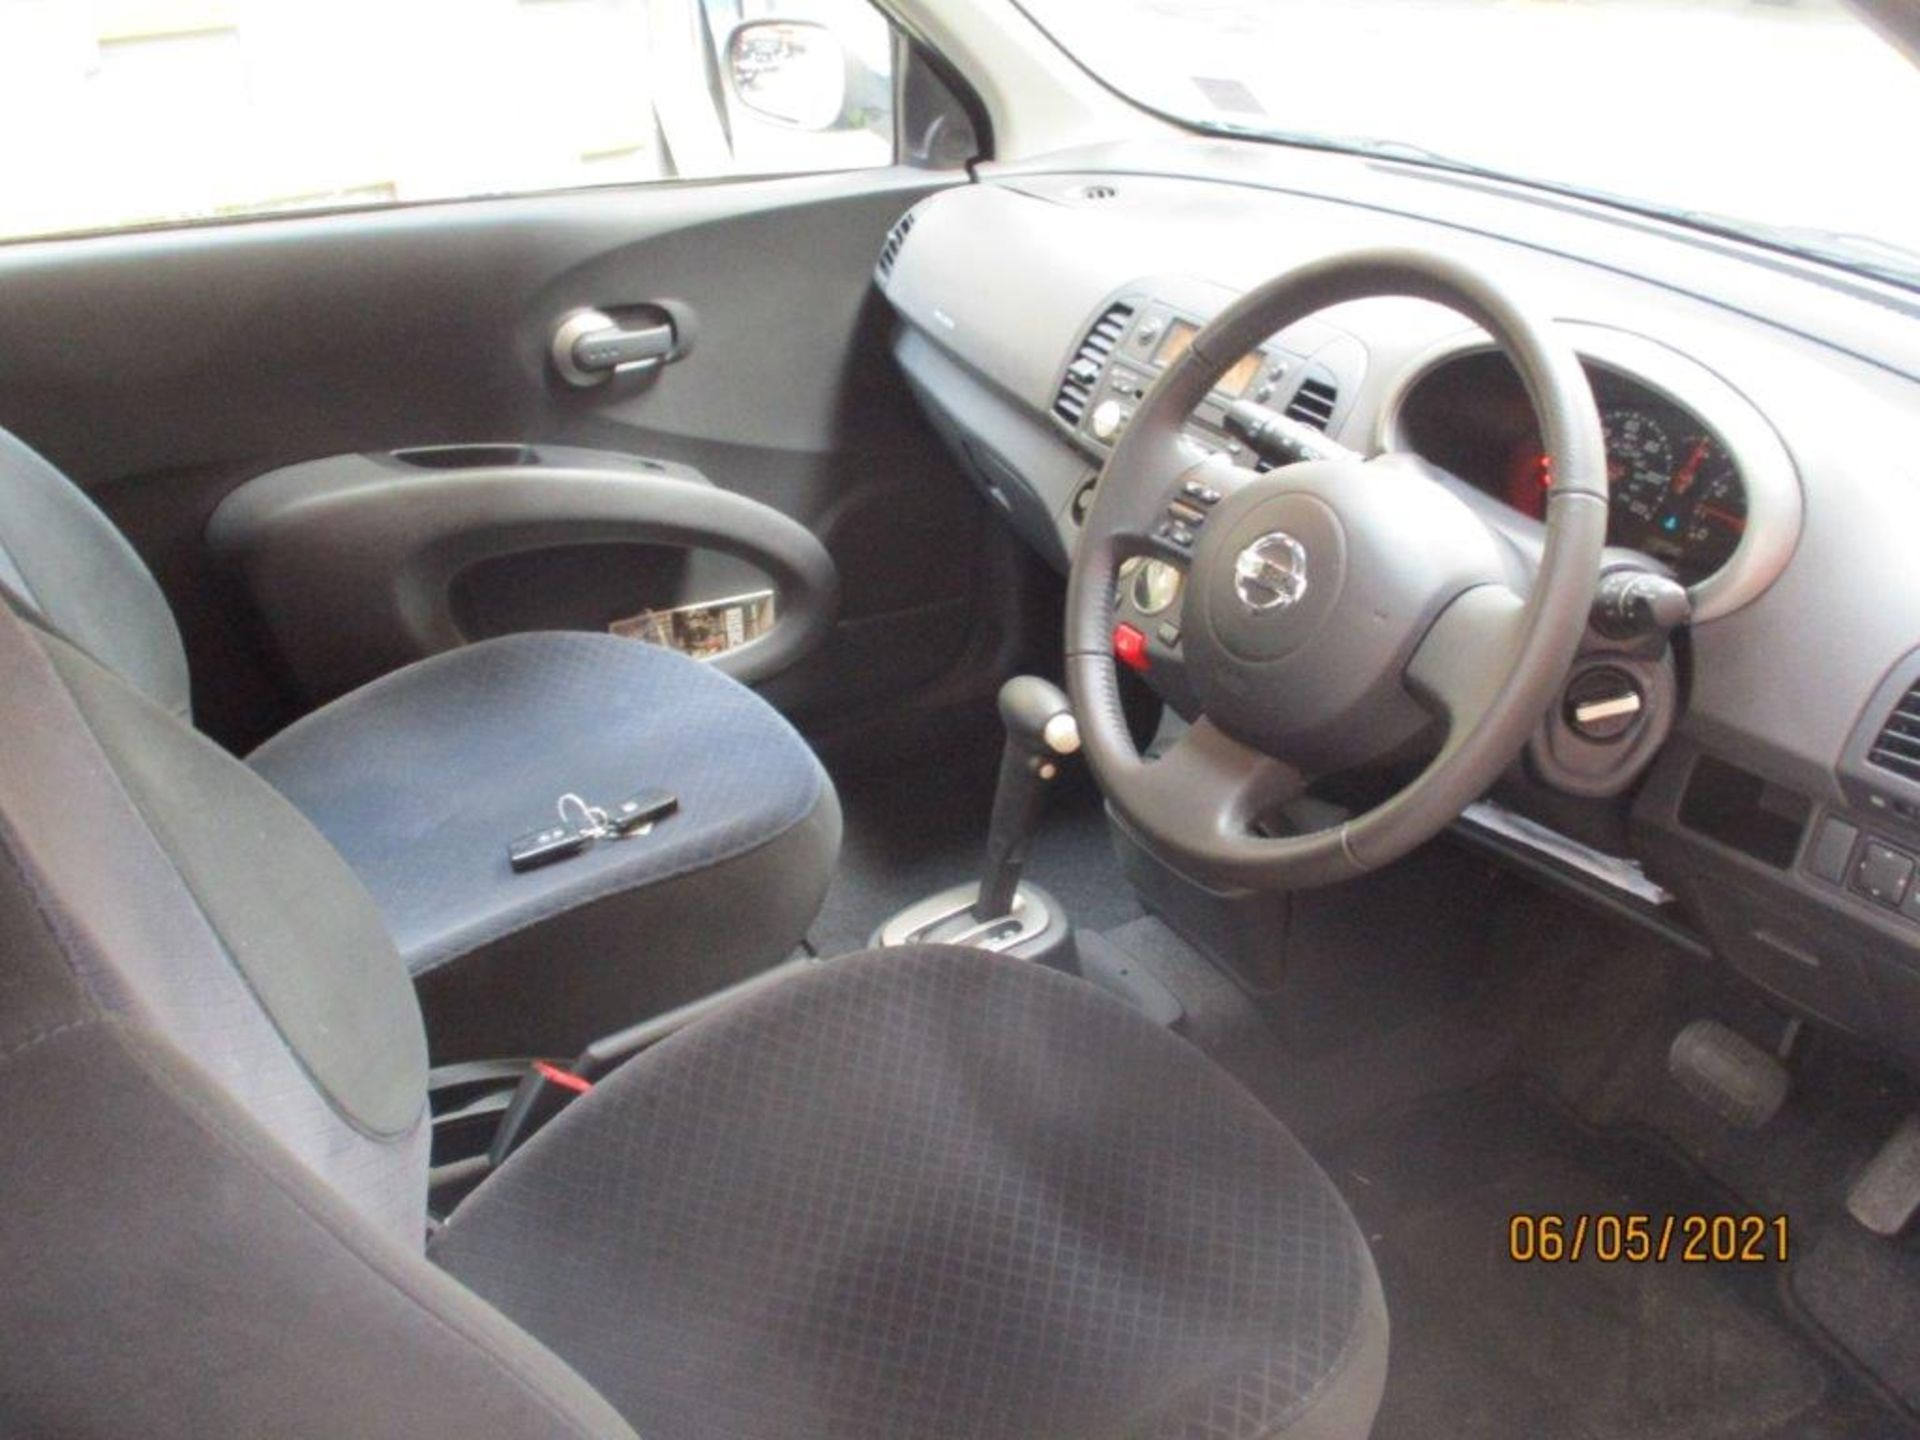 05 05 Nissan Micra SVE - Image 12 of 14